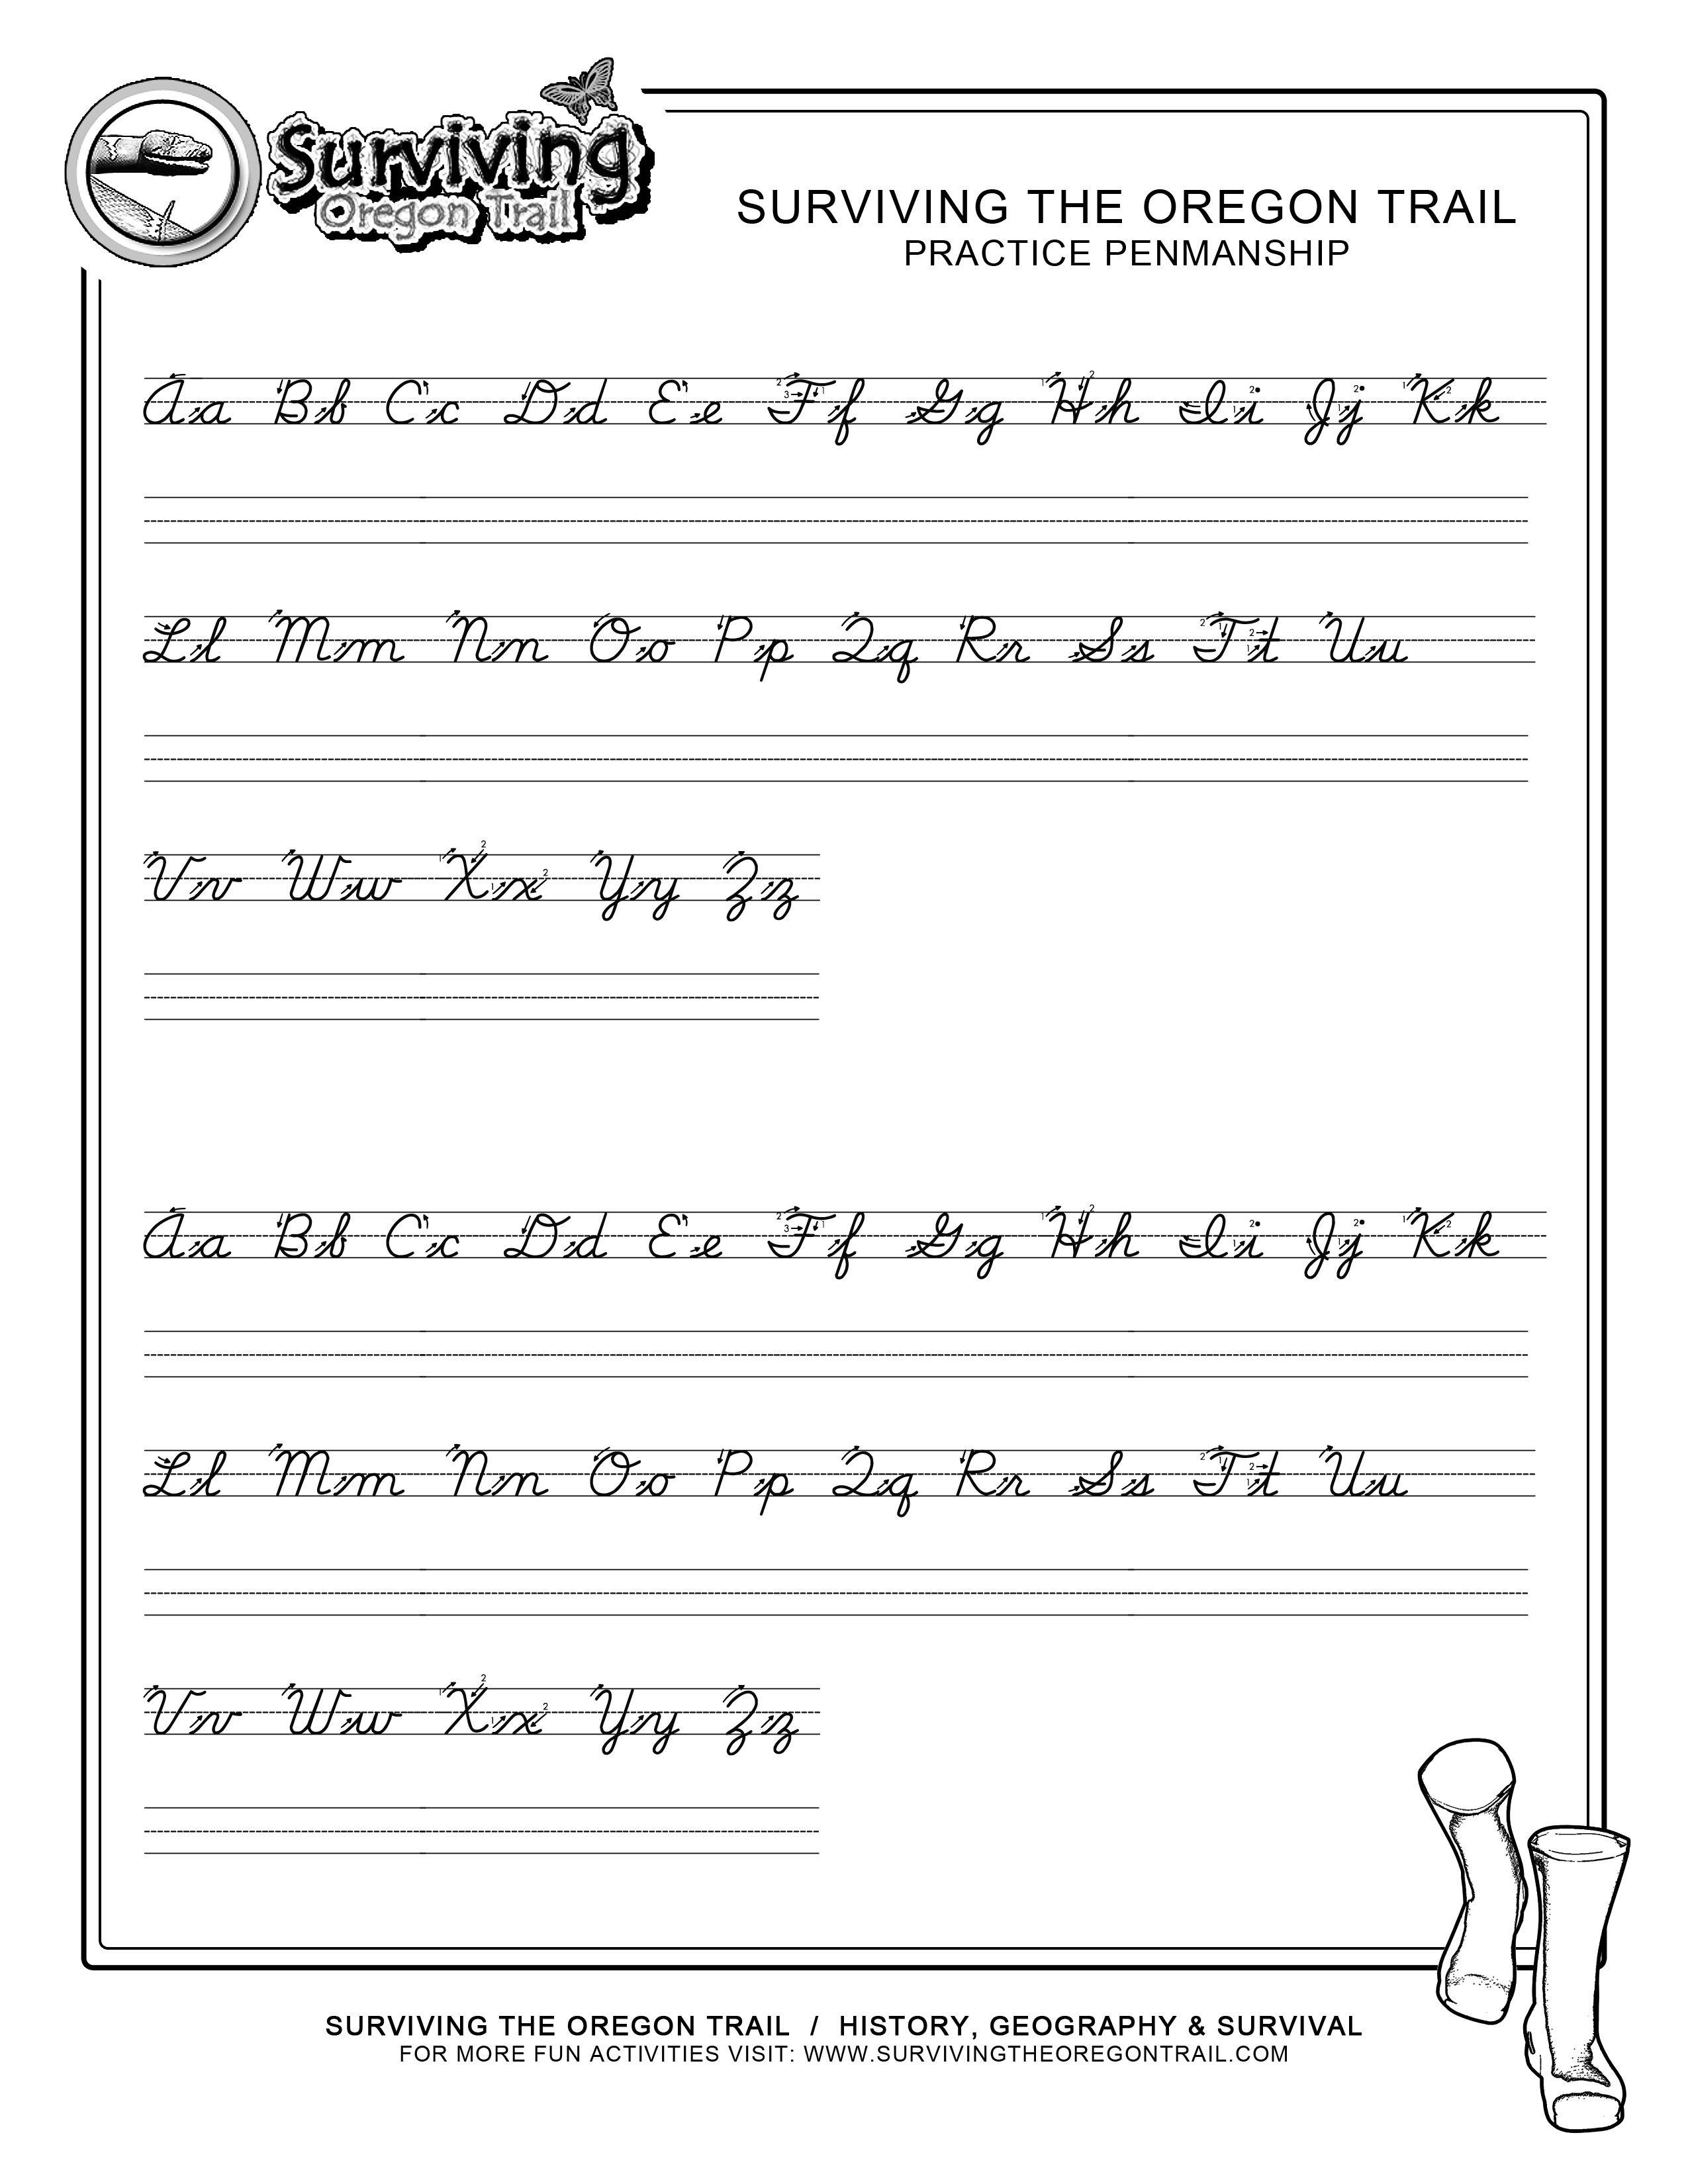 Practice Penmanship – Free Abc's Printable Cursive Writing Worksheet - Free Printable Cursive Handwriting Worksheets